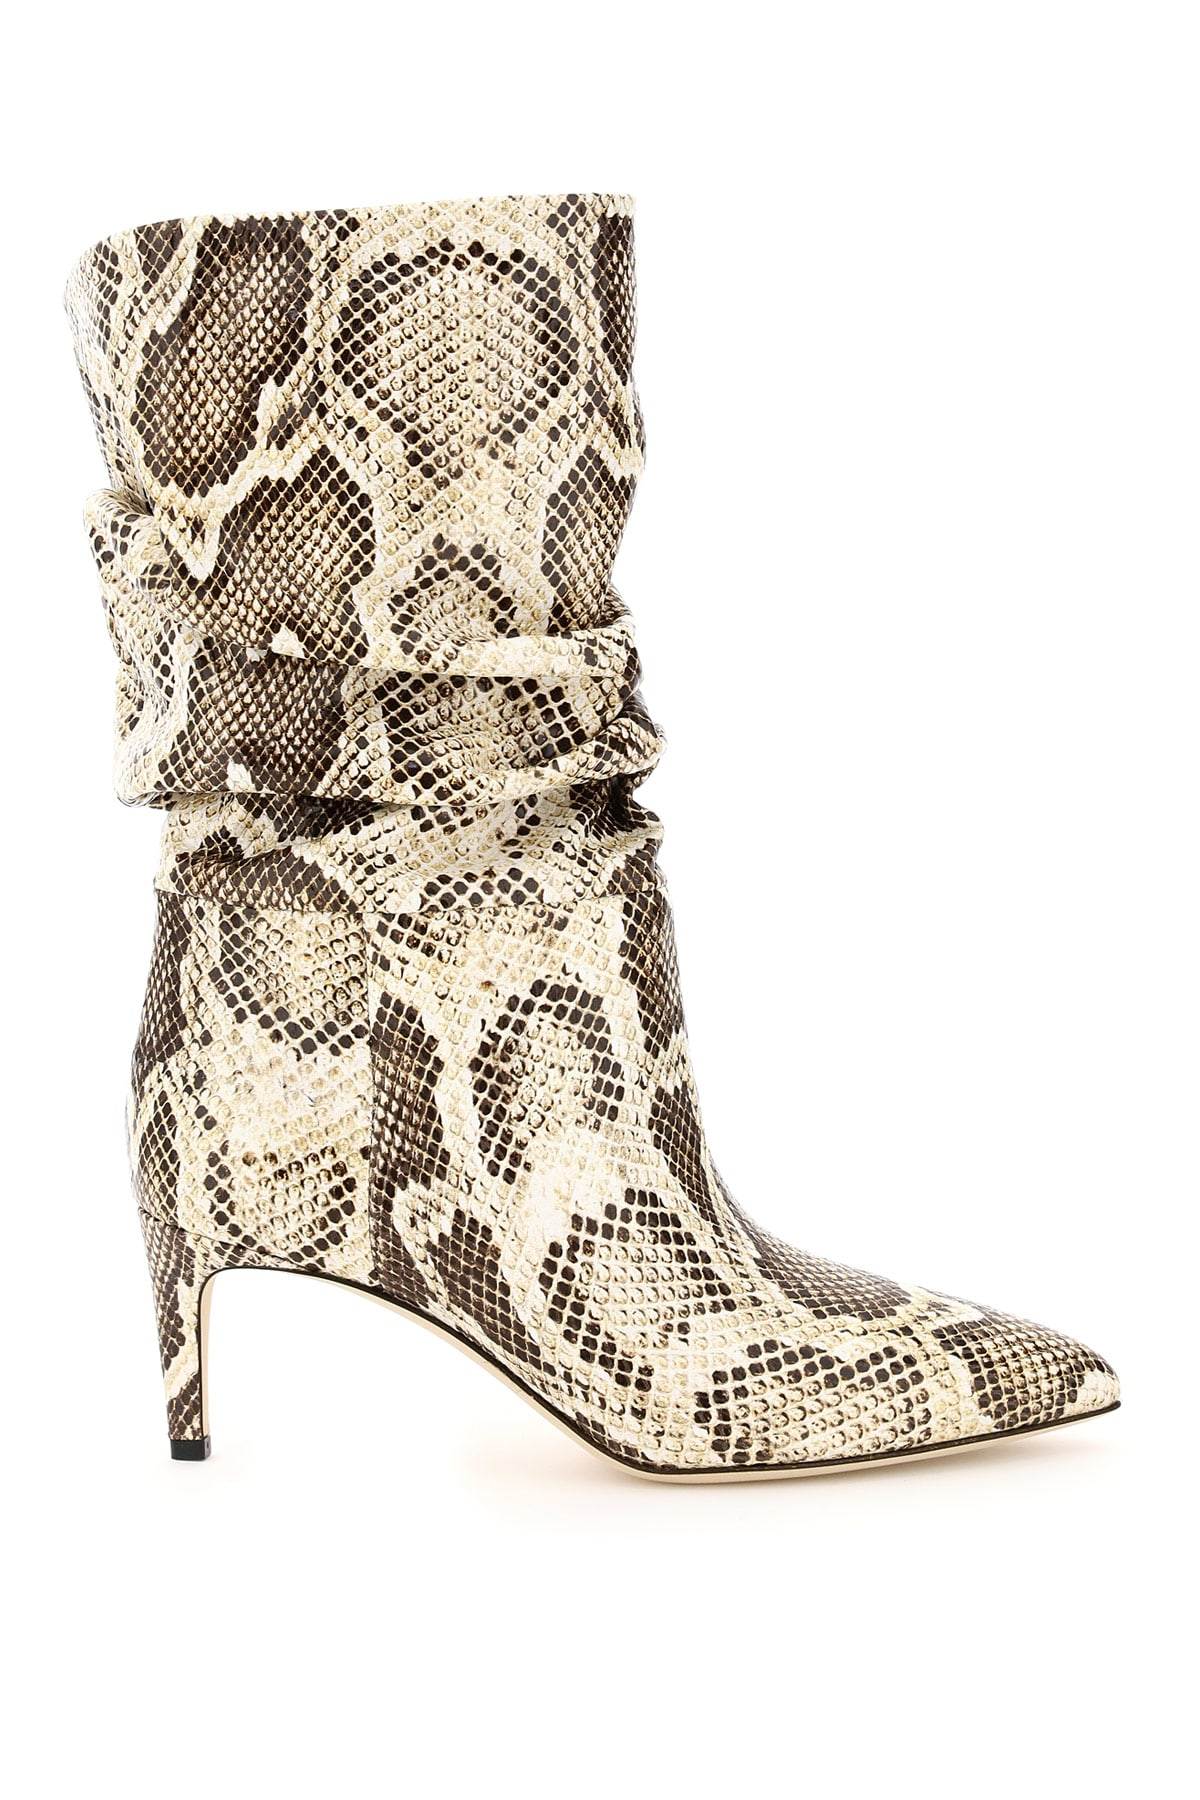 Paris Texas Python Print Slouchy Boots